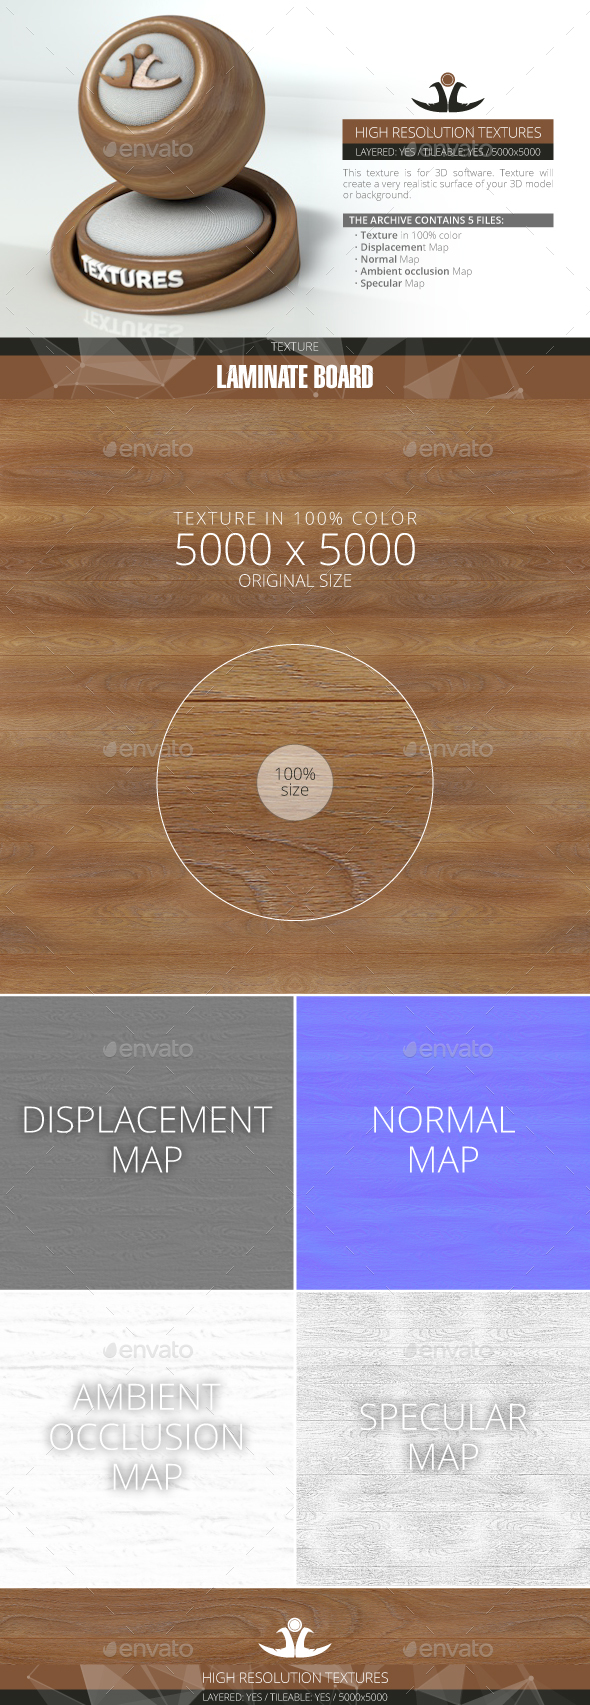 Laminate Board 4 - 3DOcean Item for Sale